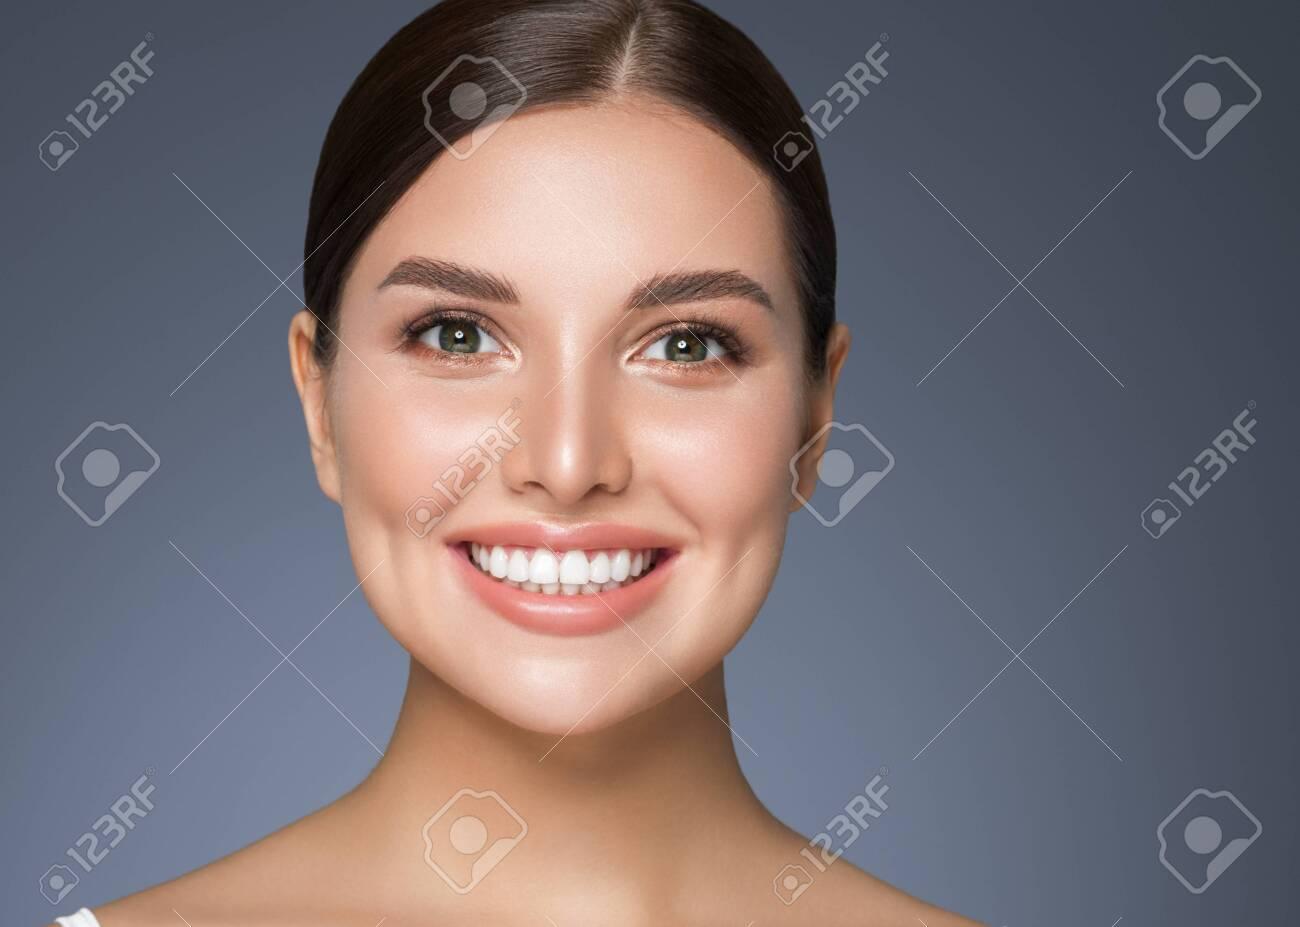 Beauty woman healthy teeth smile healthy beautiful skin model face skin care happy female - 144045244